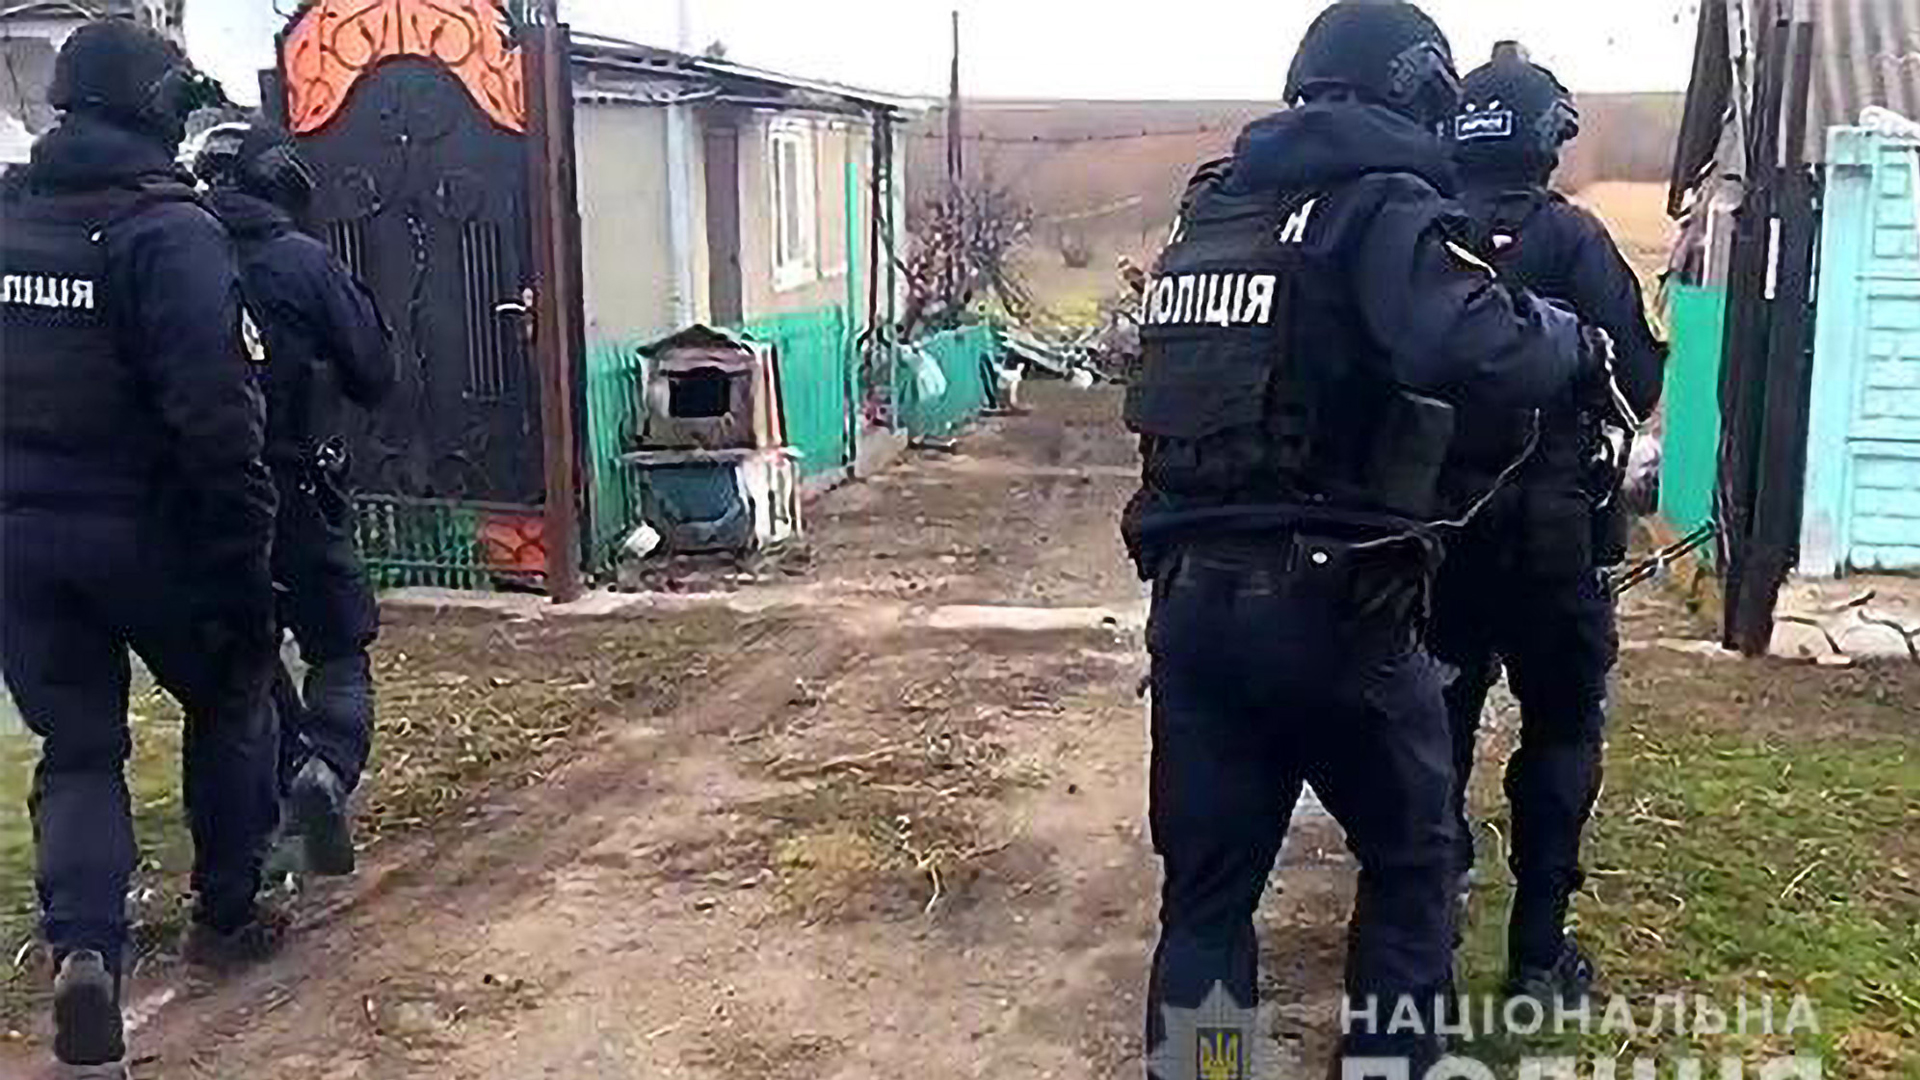 VIDEO: Drugs Ma-Fia: Women Bosses Seized In Raid On Huge Narc Gang